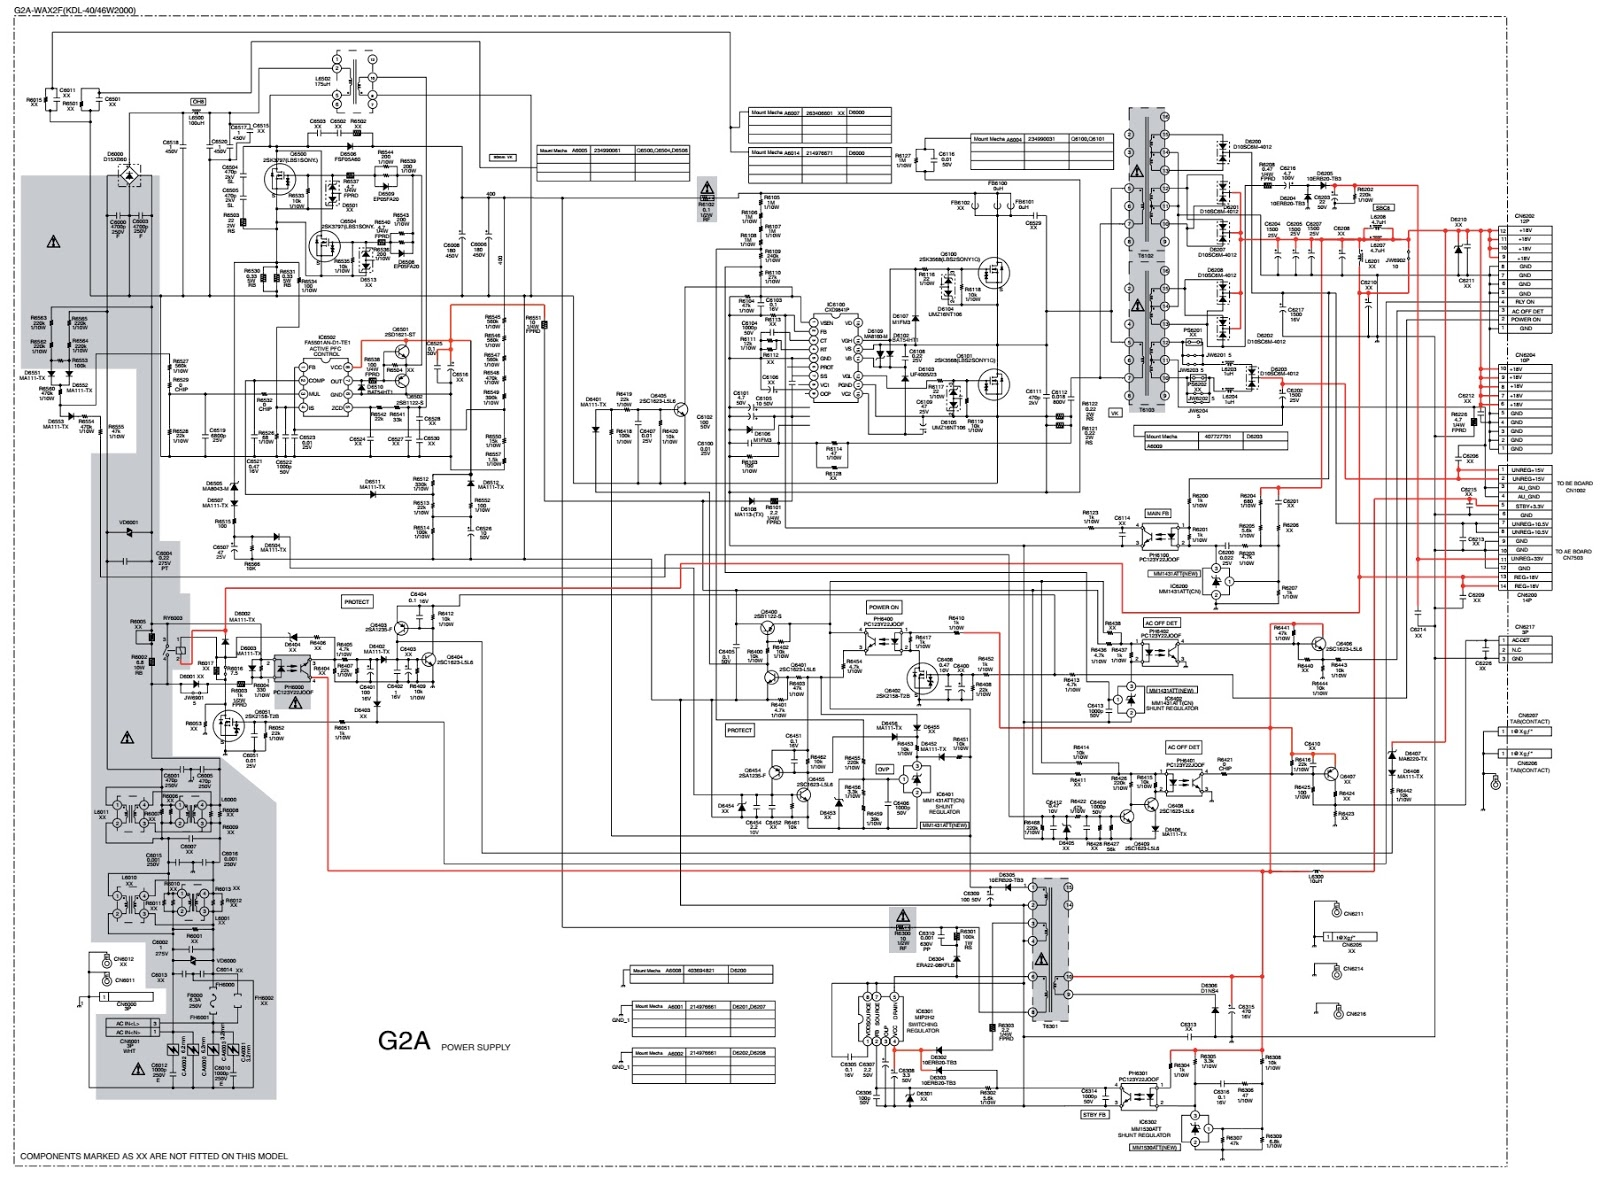 medium resolution of diagram sony led tv diagram full version hd quality tv diagram konka led lcd tv 32f3000c supra stv lcs26740 tv schematic power and